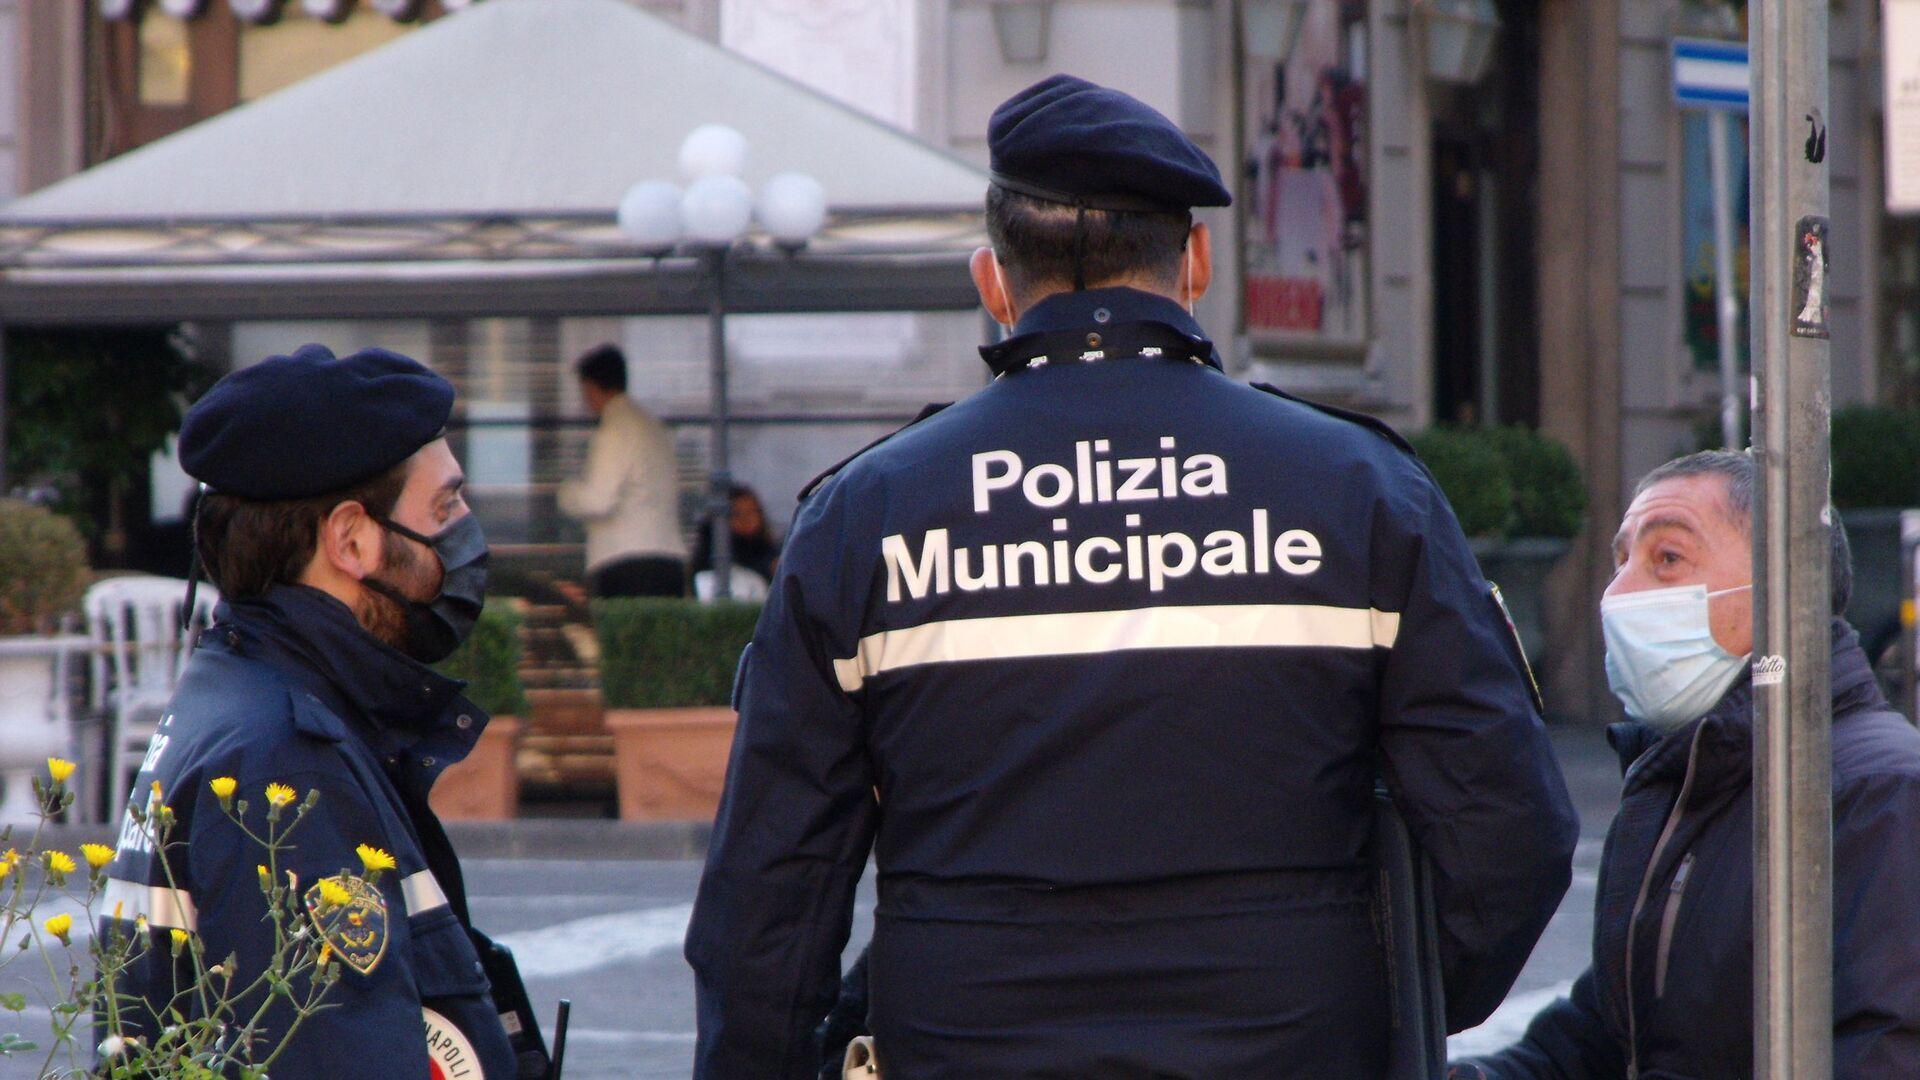 Napoli polizia municipale, uomo in mascherina  - Sputnik Italia, 1920, 05.03.2021